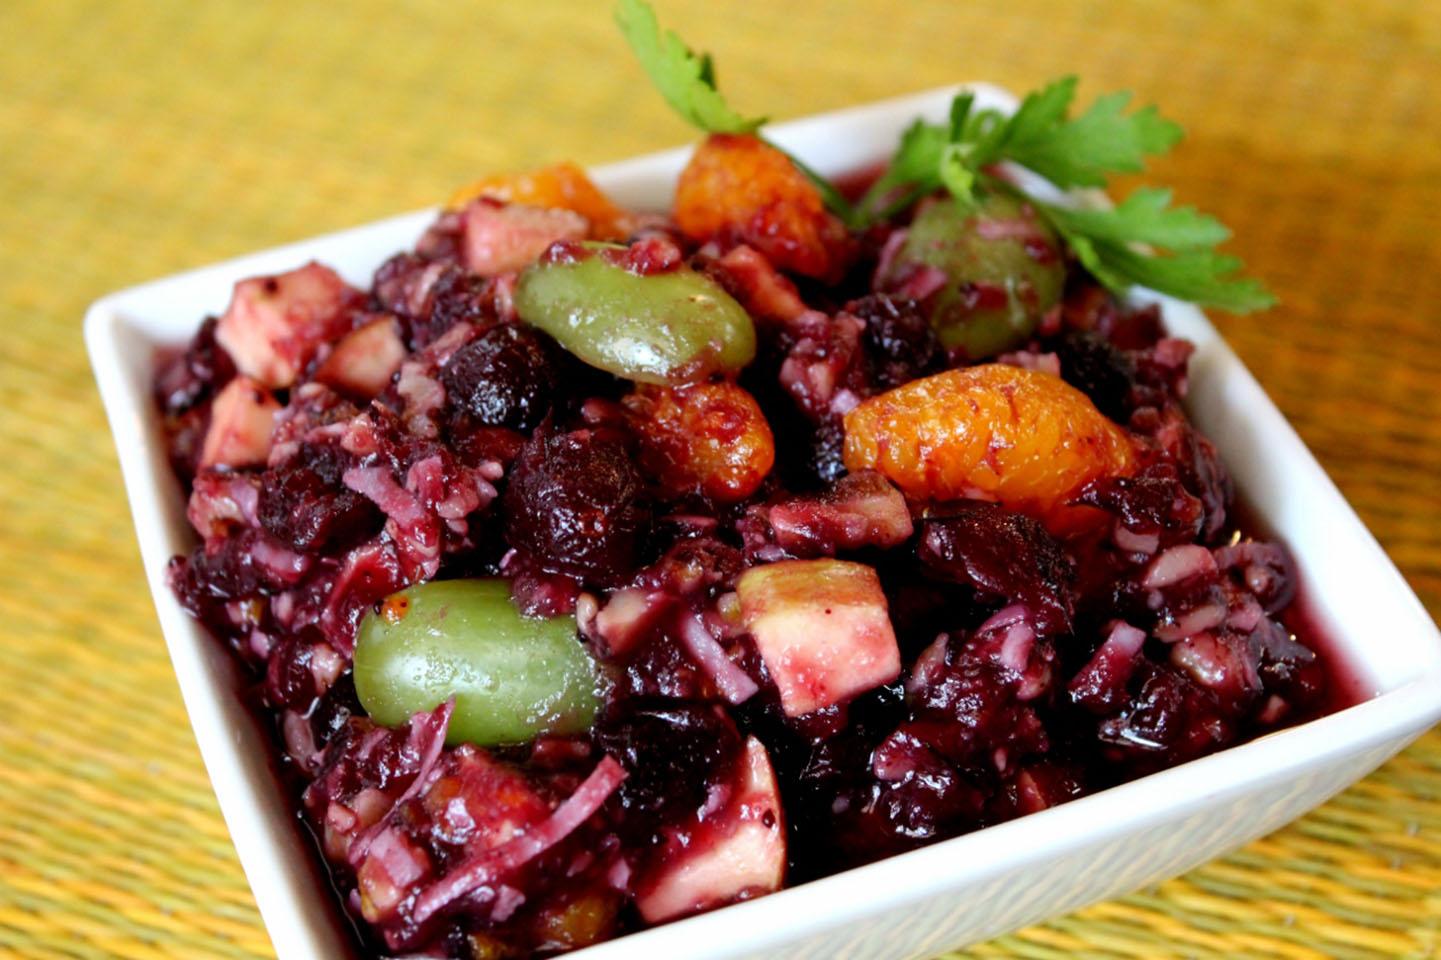 No Cook Cranberry Salad Lyndsay Rose